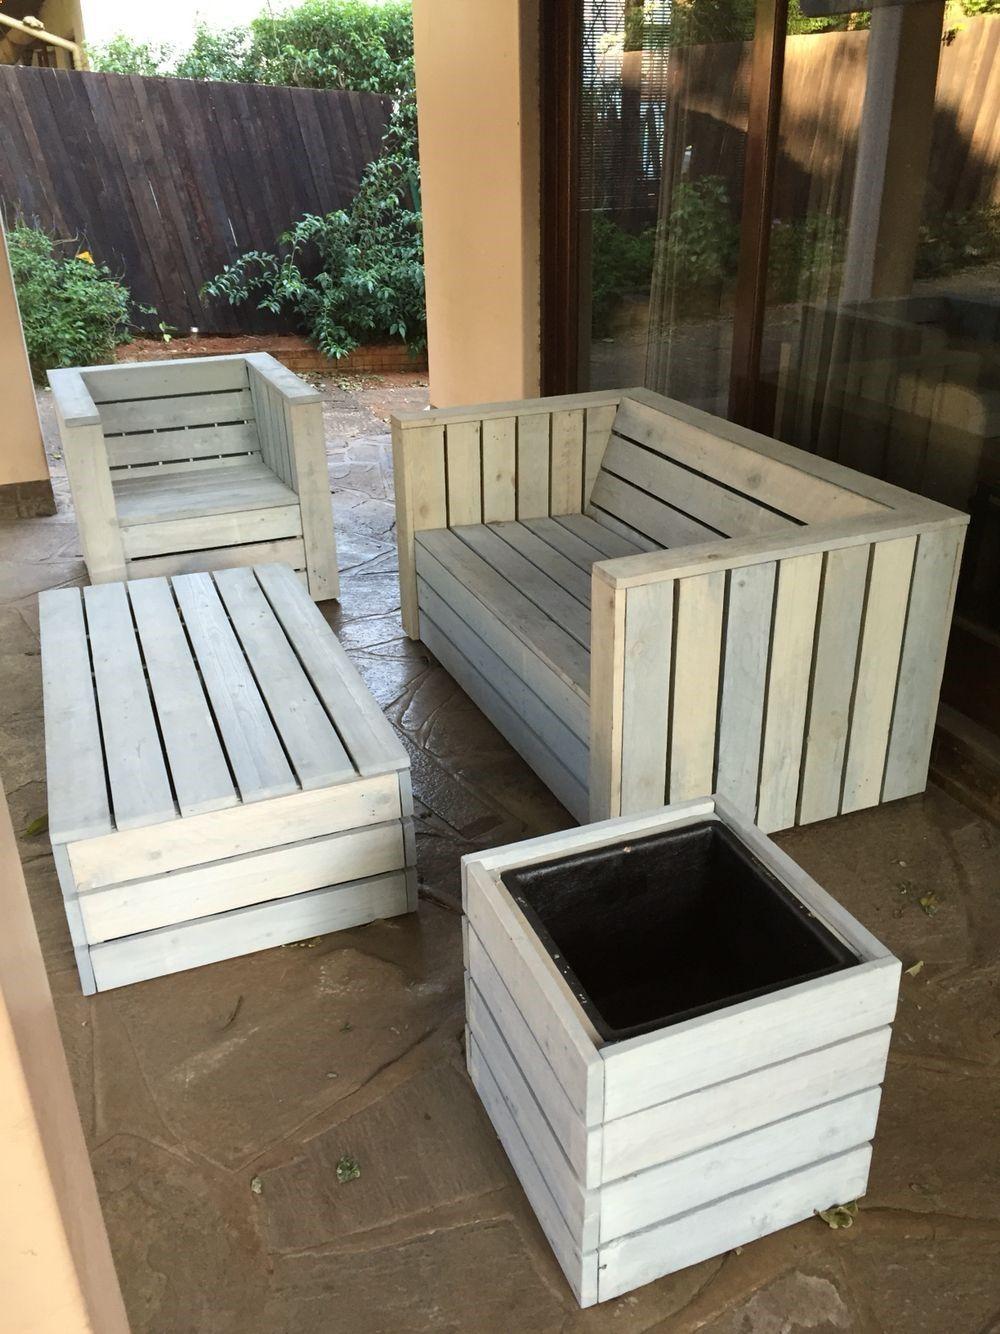 Pallet wood patio furniture set also pinterest